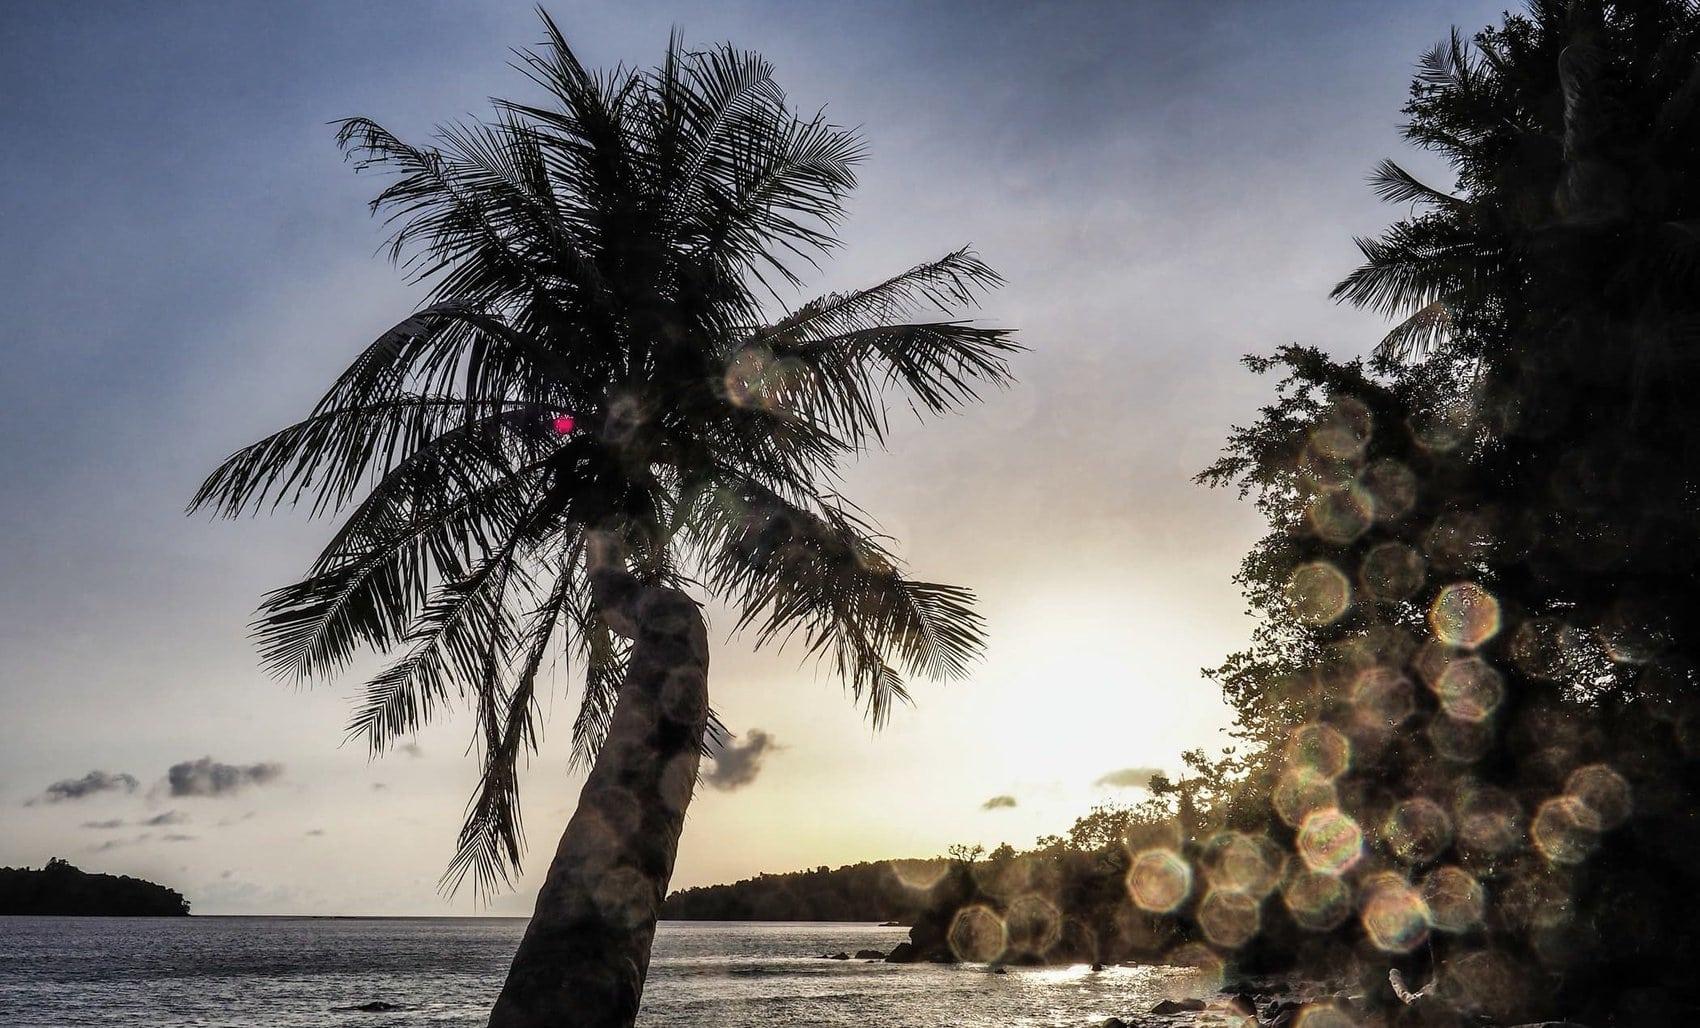 Pulau Weh Sumatra